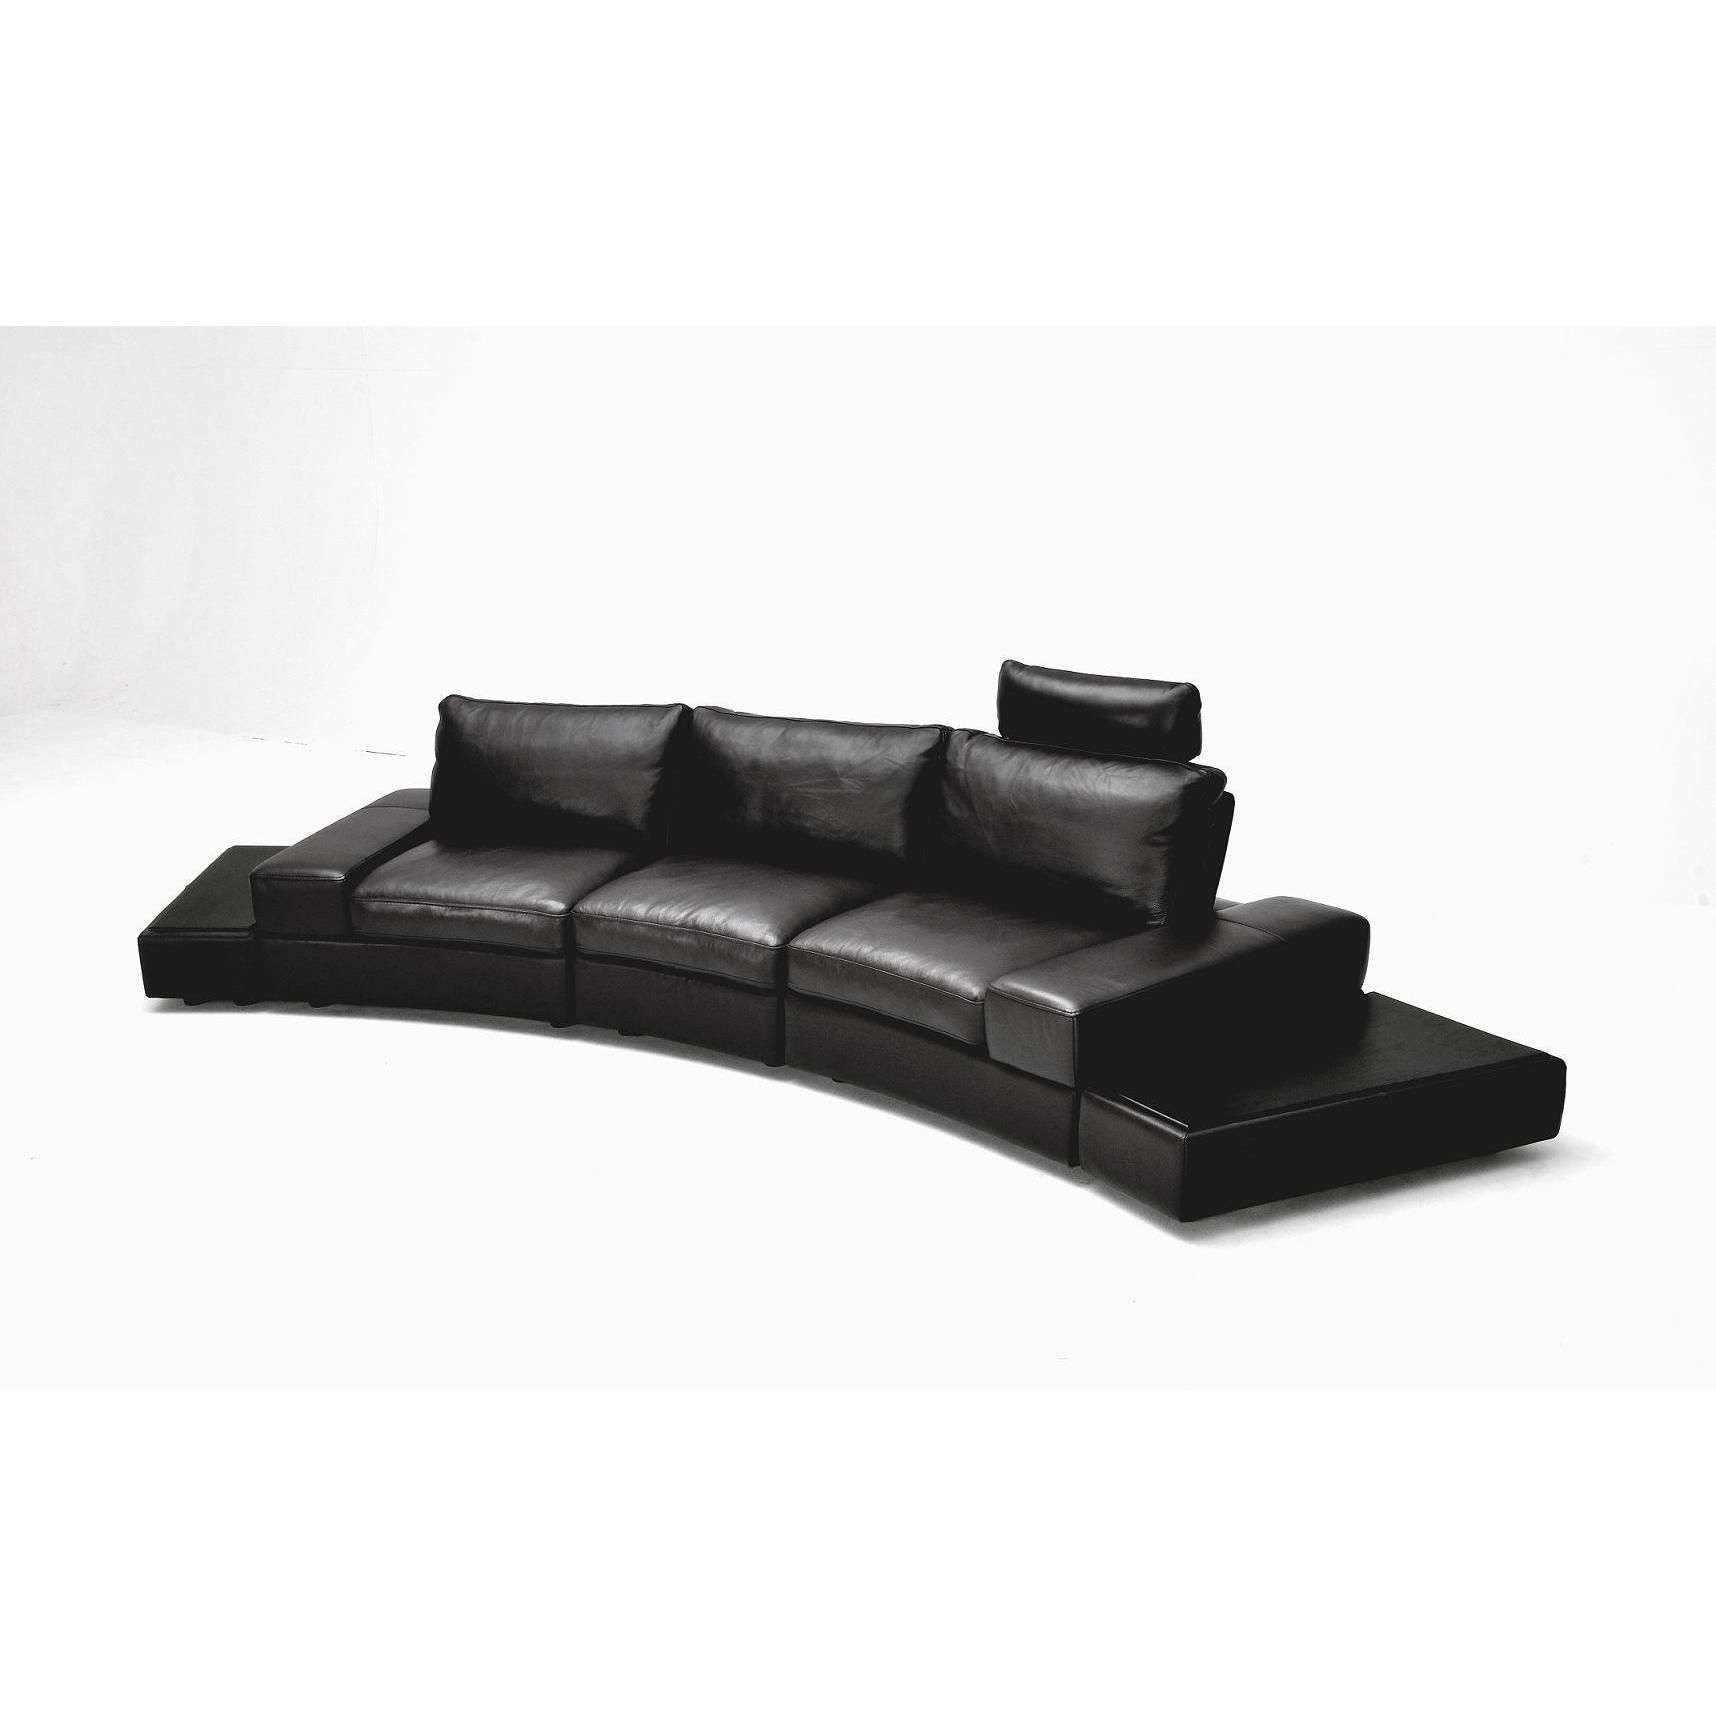 Divani Casa Lilac Black Full Grain Leather Sectional Sofa Set